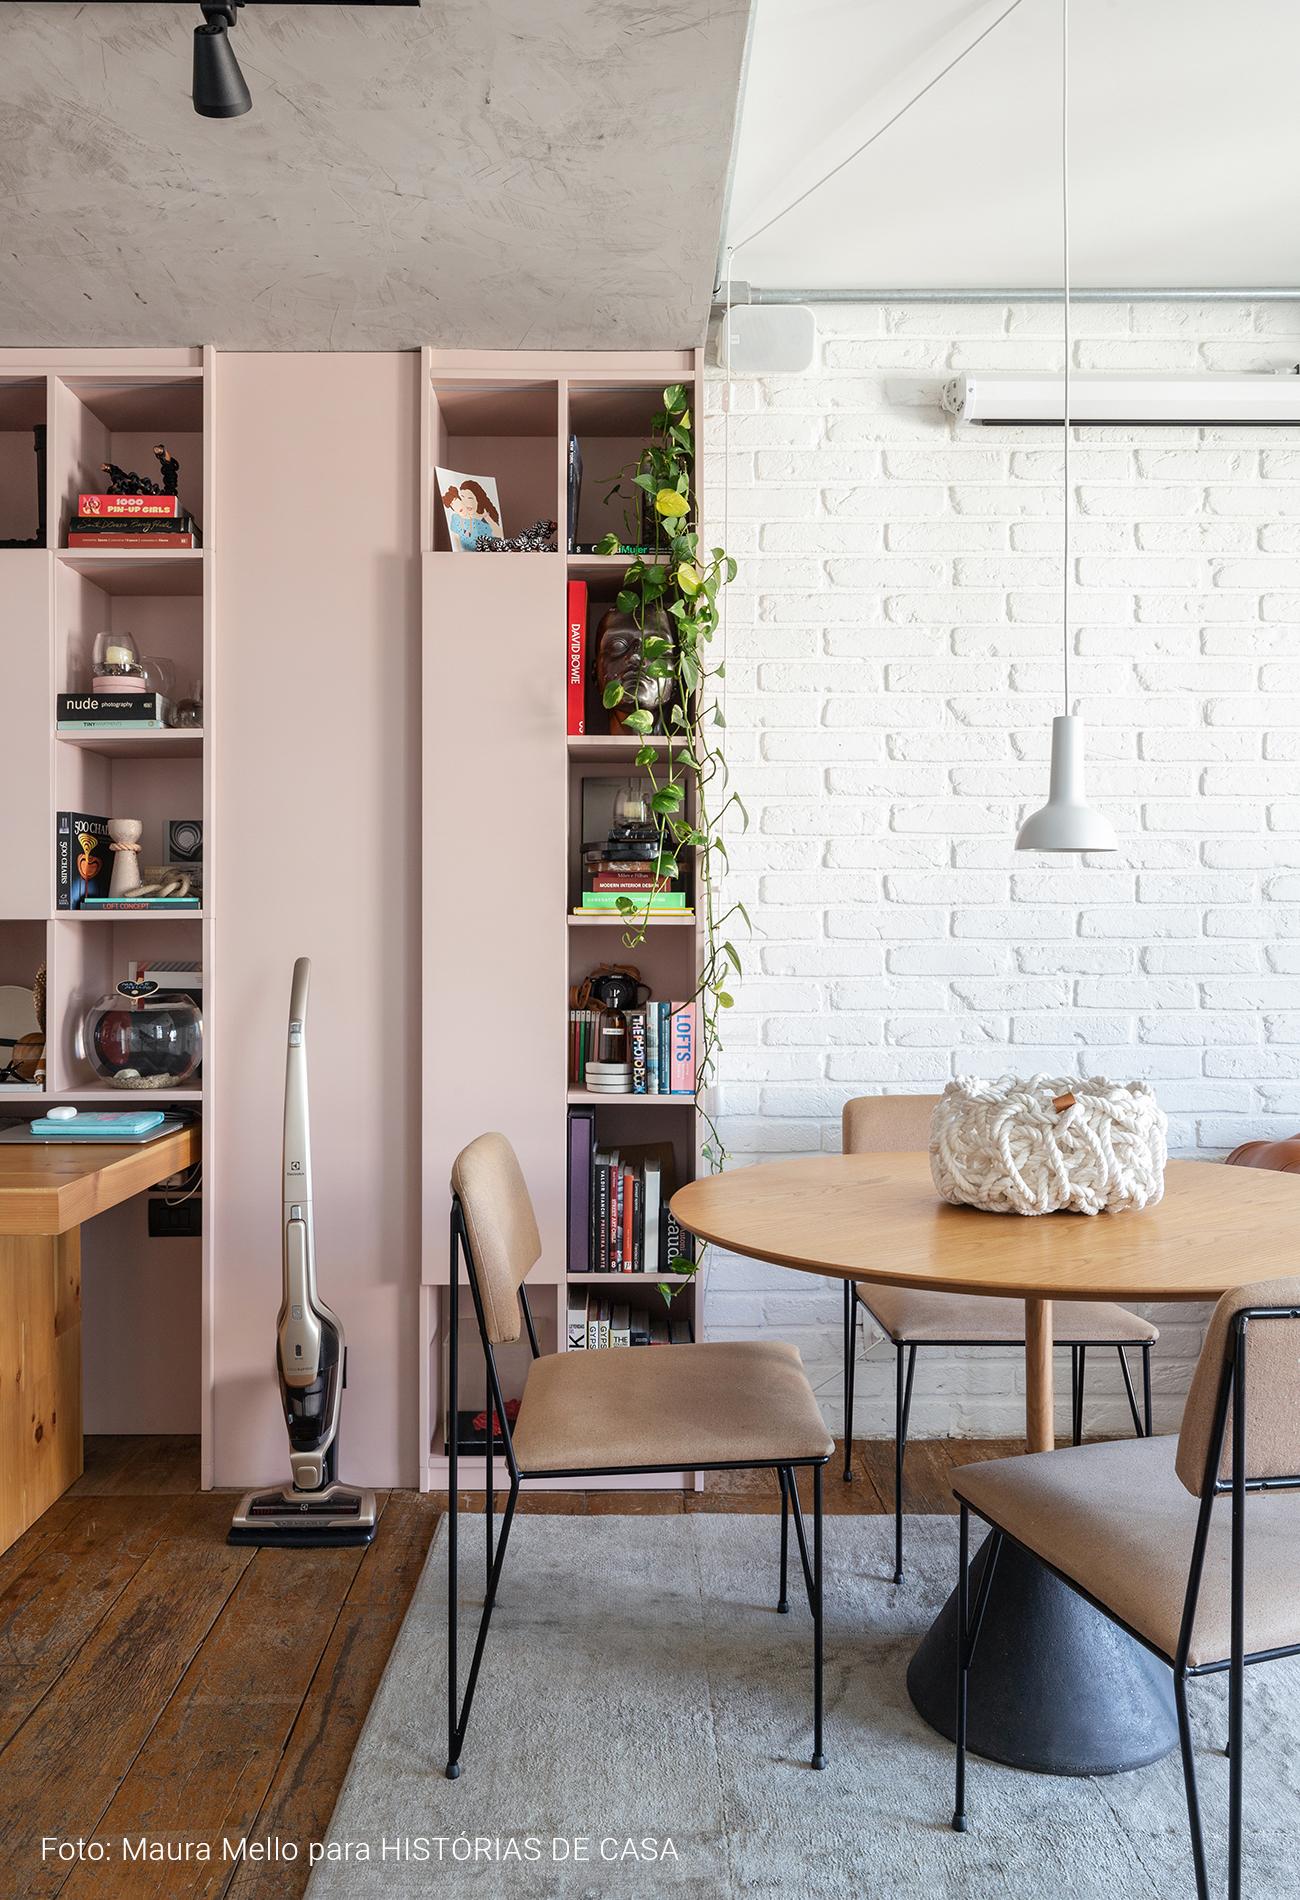 Apartamento estilo loft com marcenaria rosa